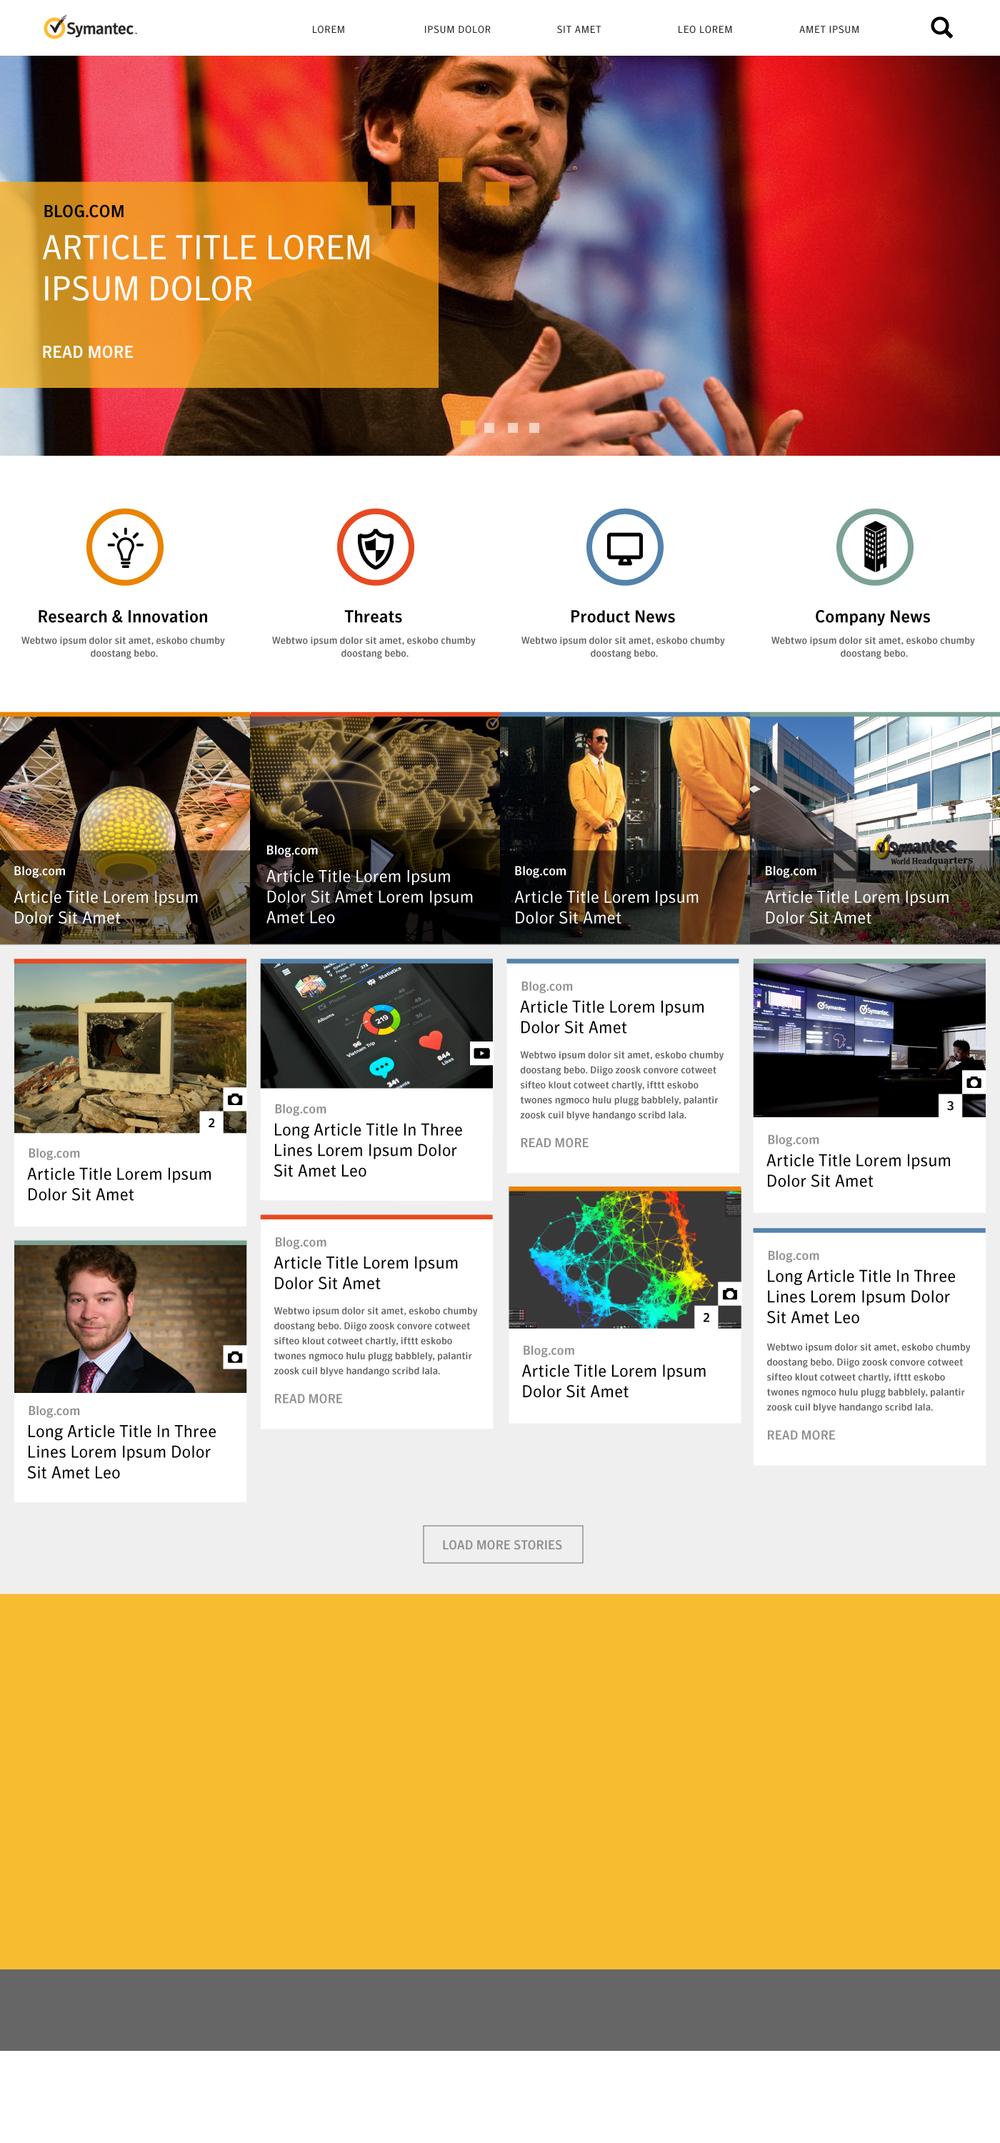 Symantec_Newsroom_01_00.jpg